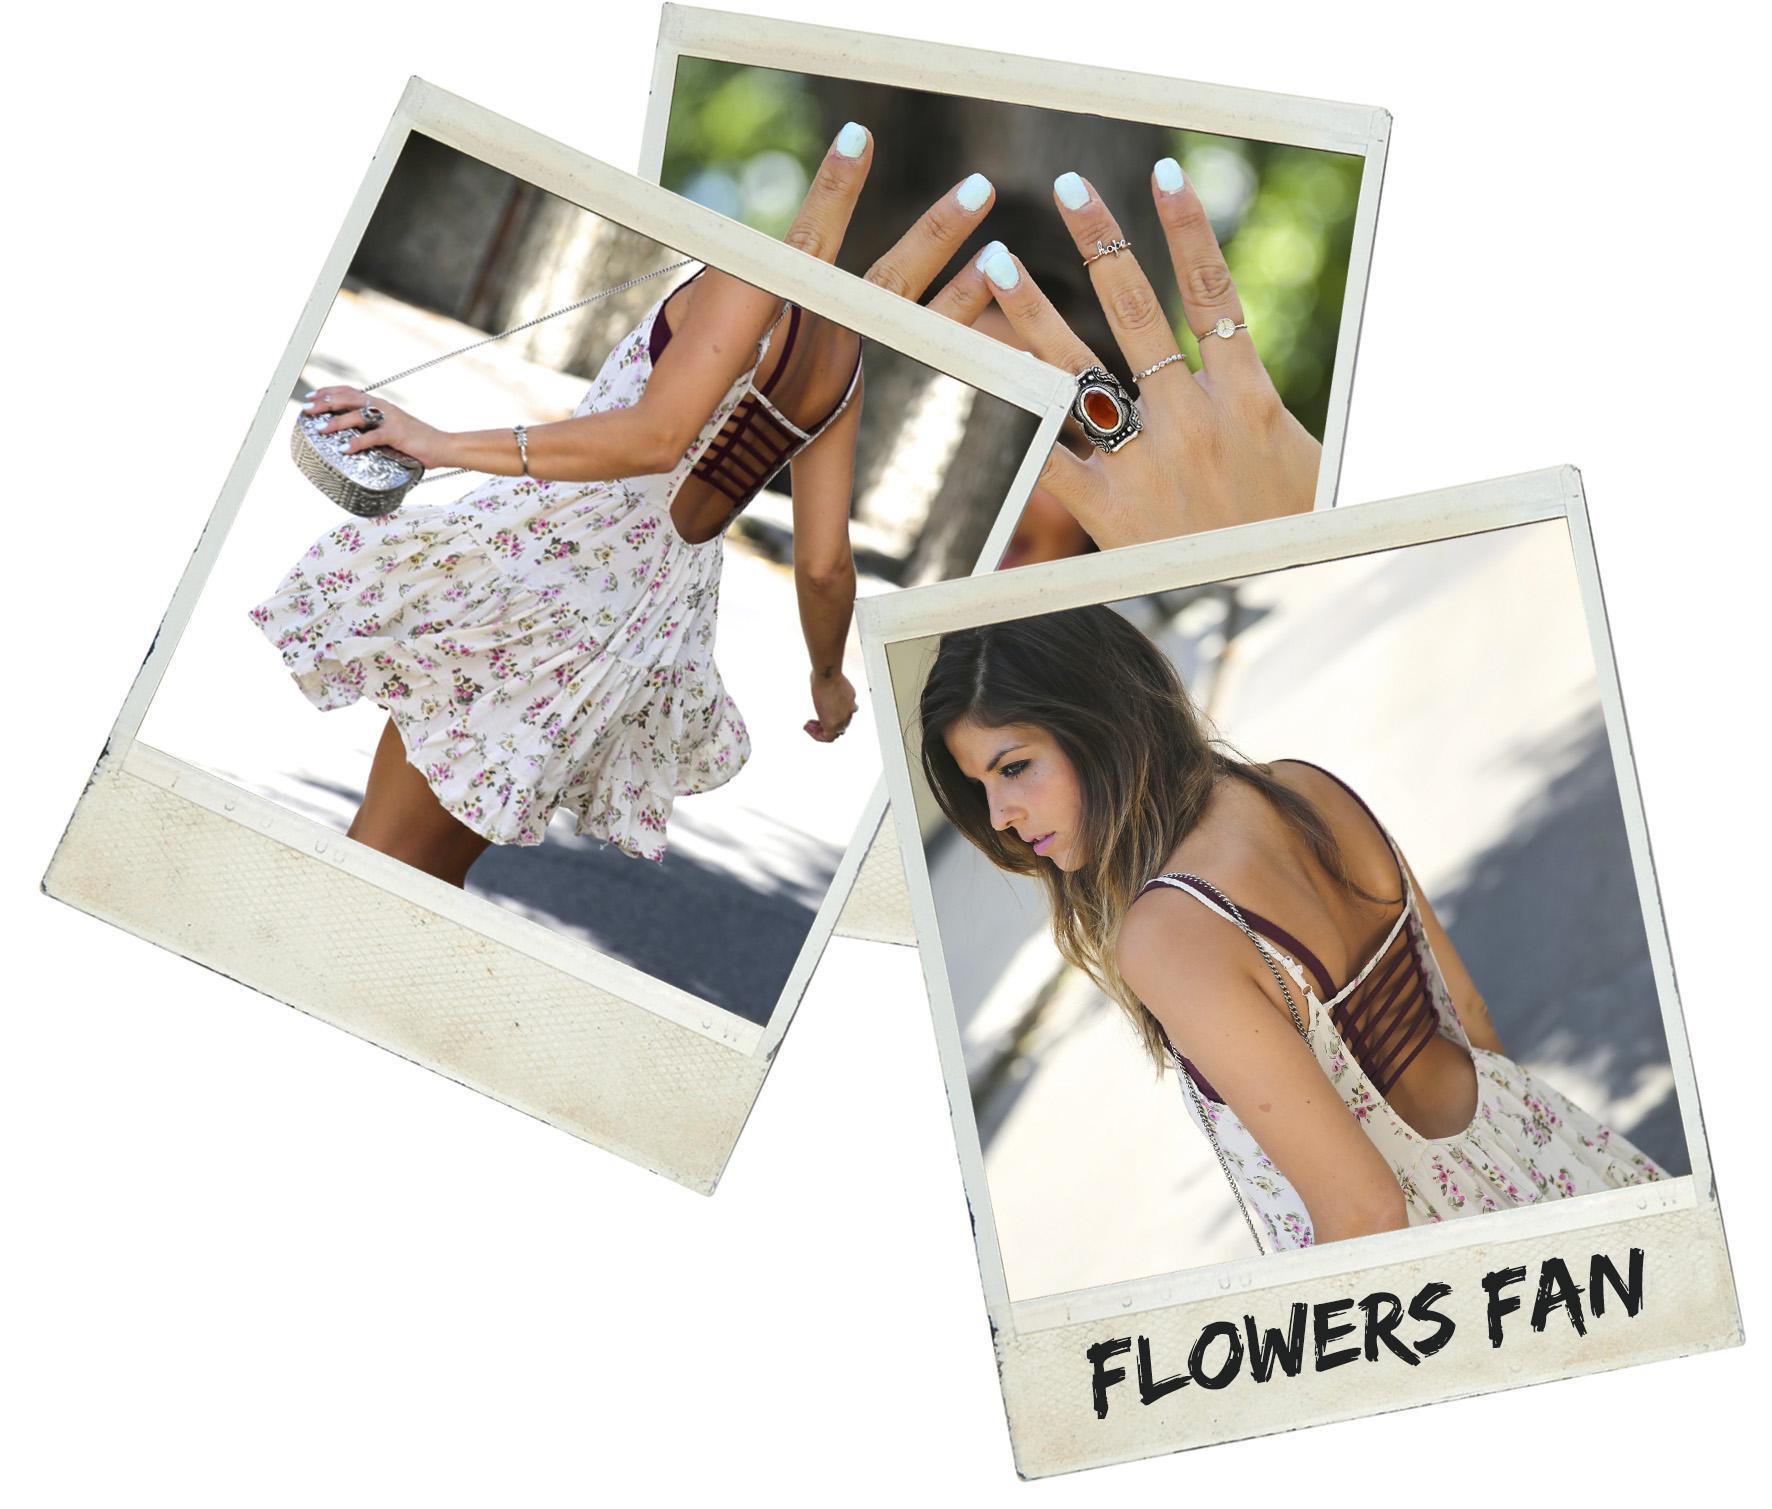 trendy_taste-look-outfit-street_style-ootd-blog-blogger-fashion_spain-moda_españa-vince_camuto-botines_granates-burgundy_booties-flower_print-estampado_flores-silver_bag-bolso_plata-estampado_flores-boho-top-polaroid